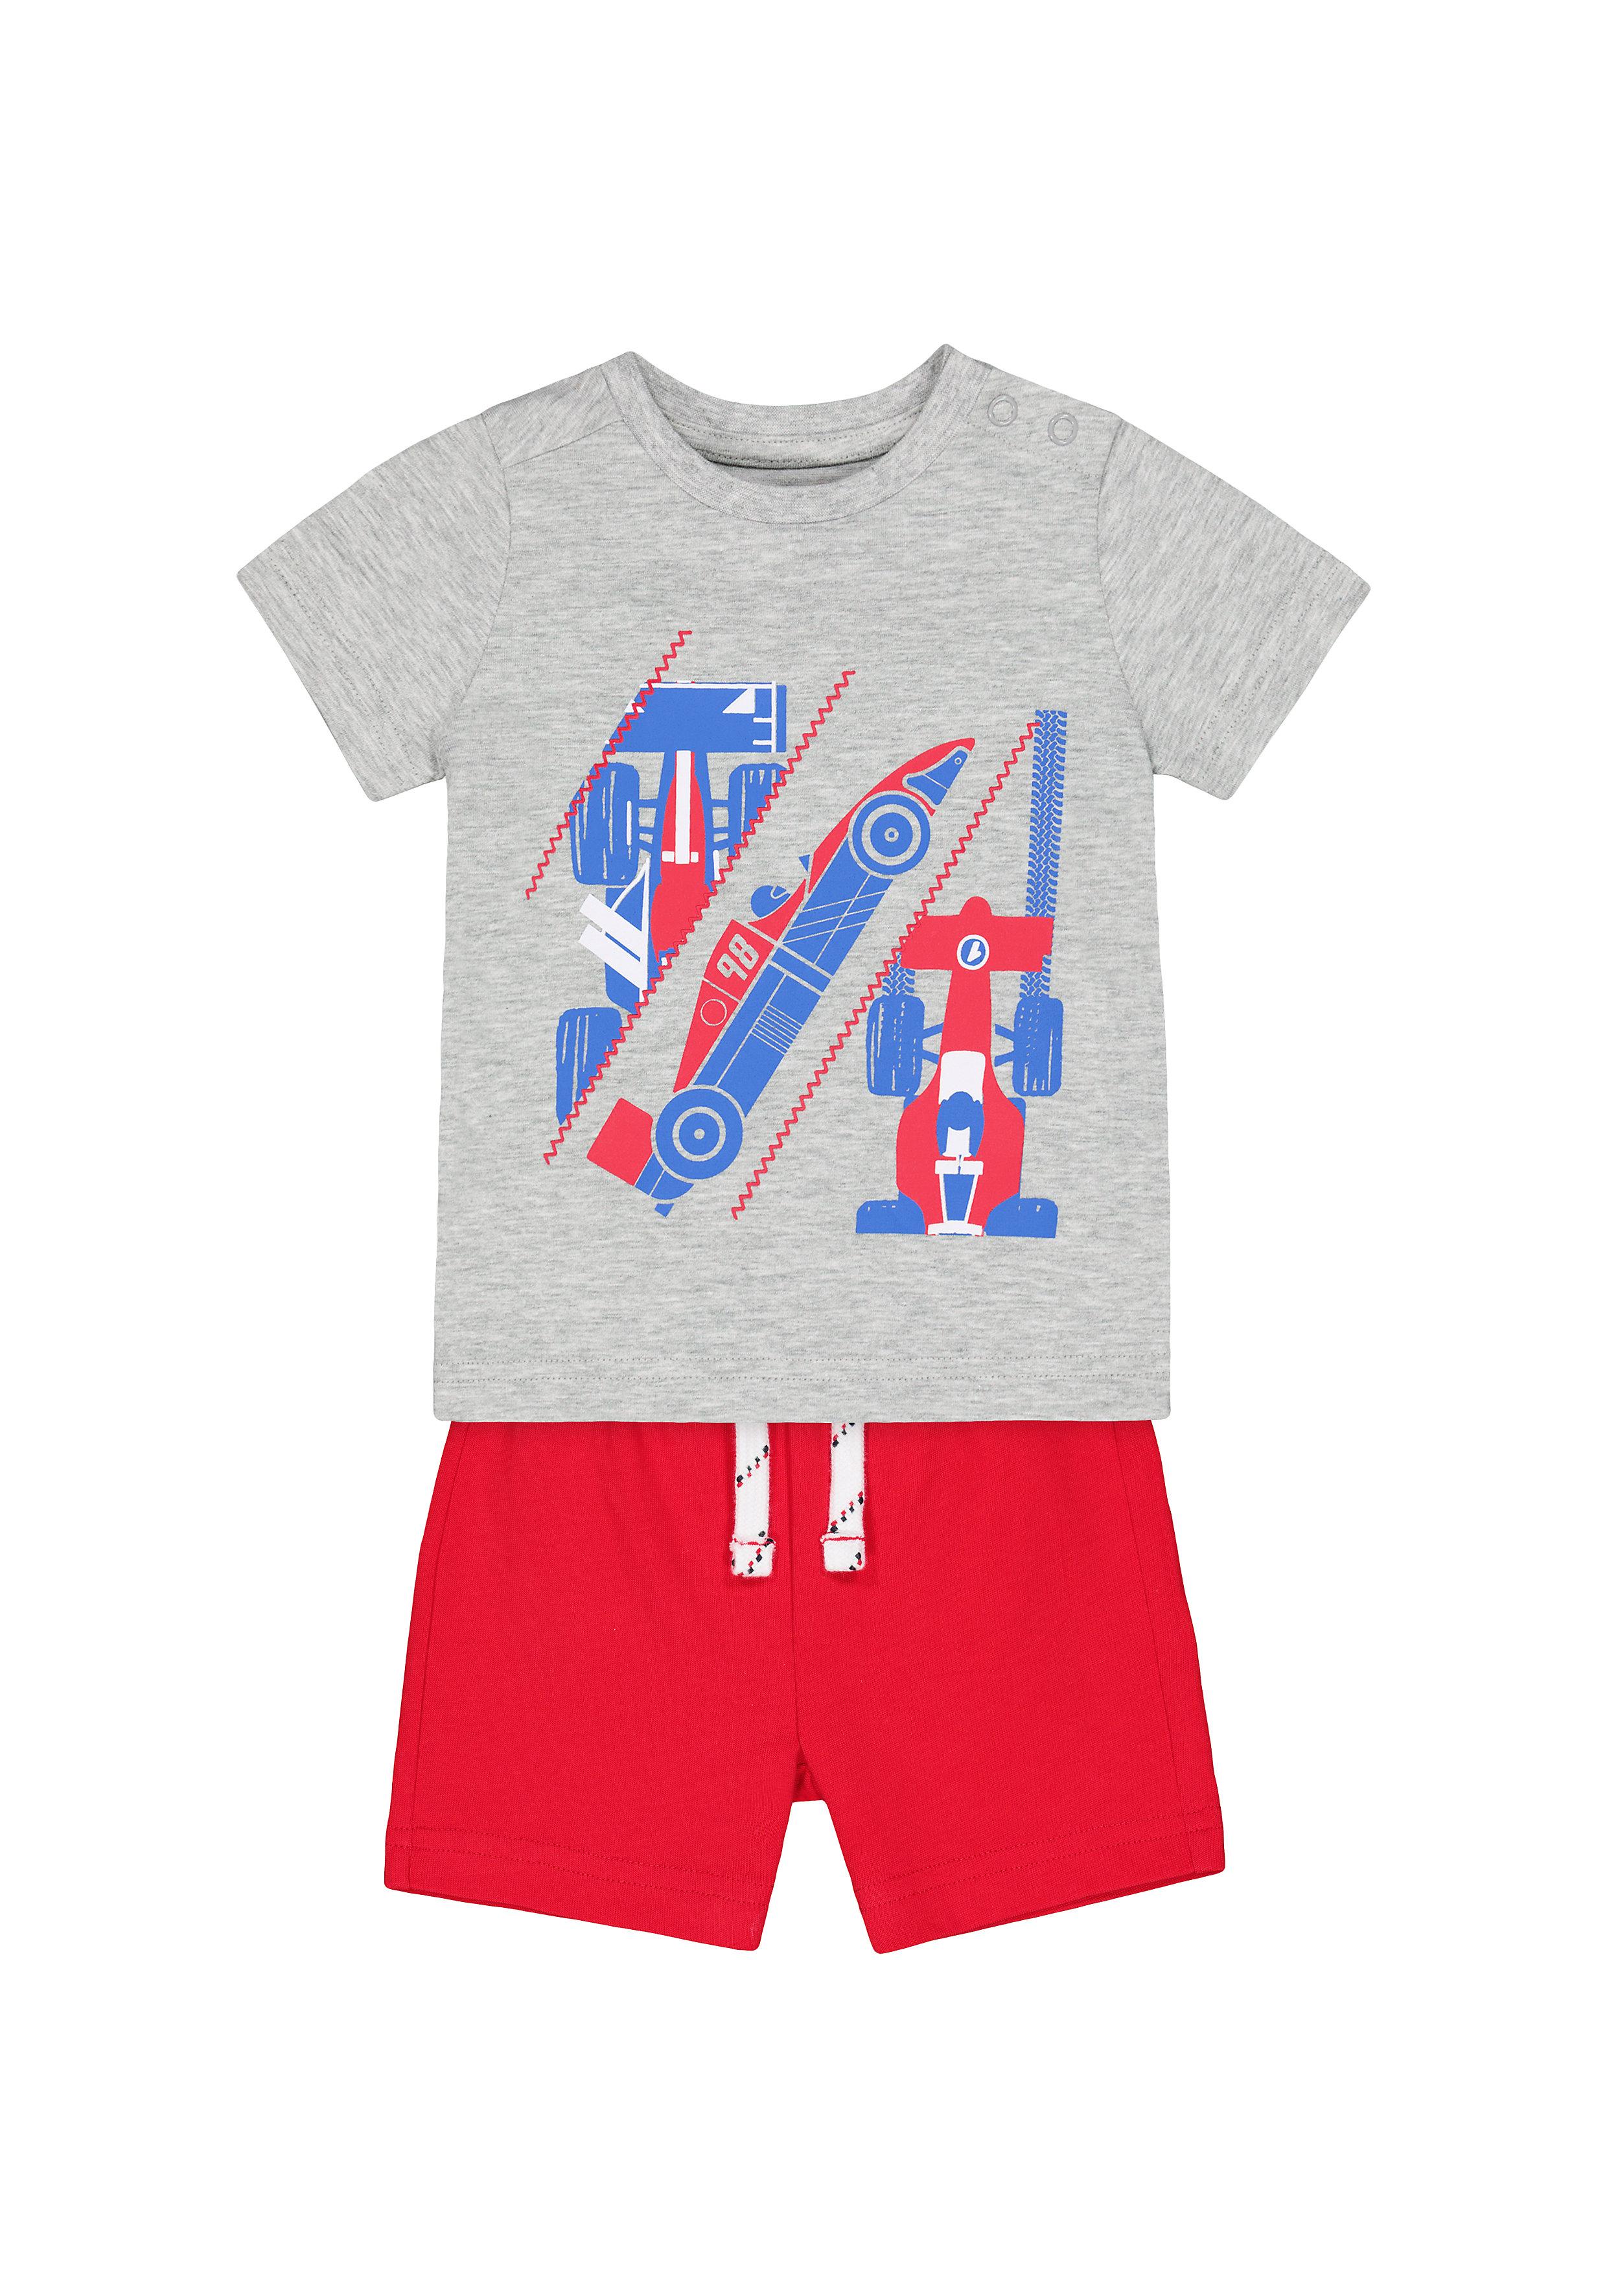 Mothercare | Boys Half Sleeves T-Shirt And Shorts Set Racing Car Print - Multicolor